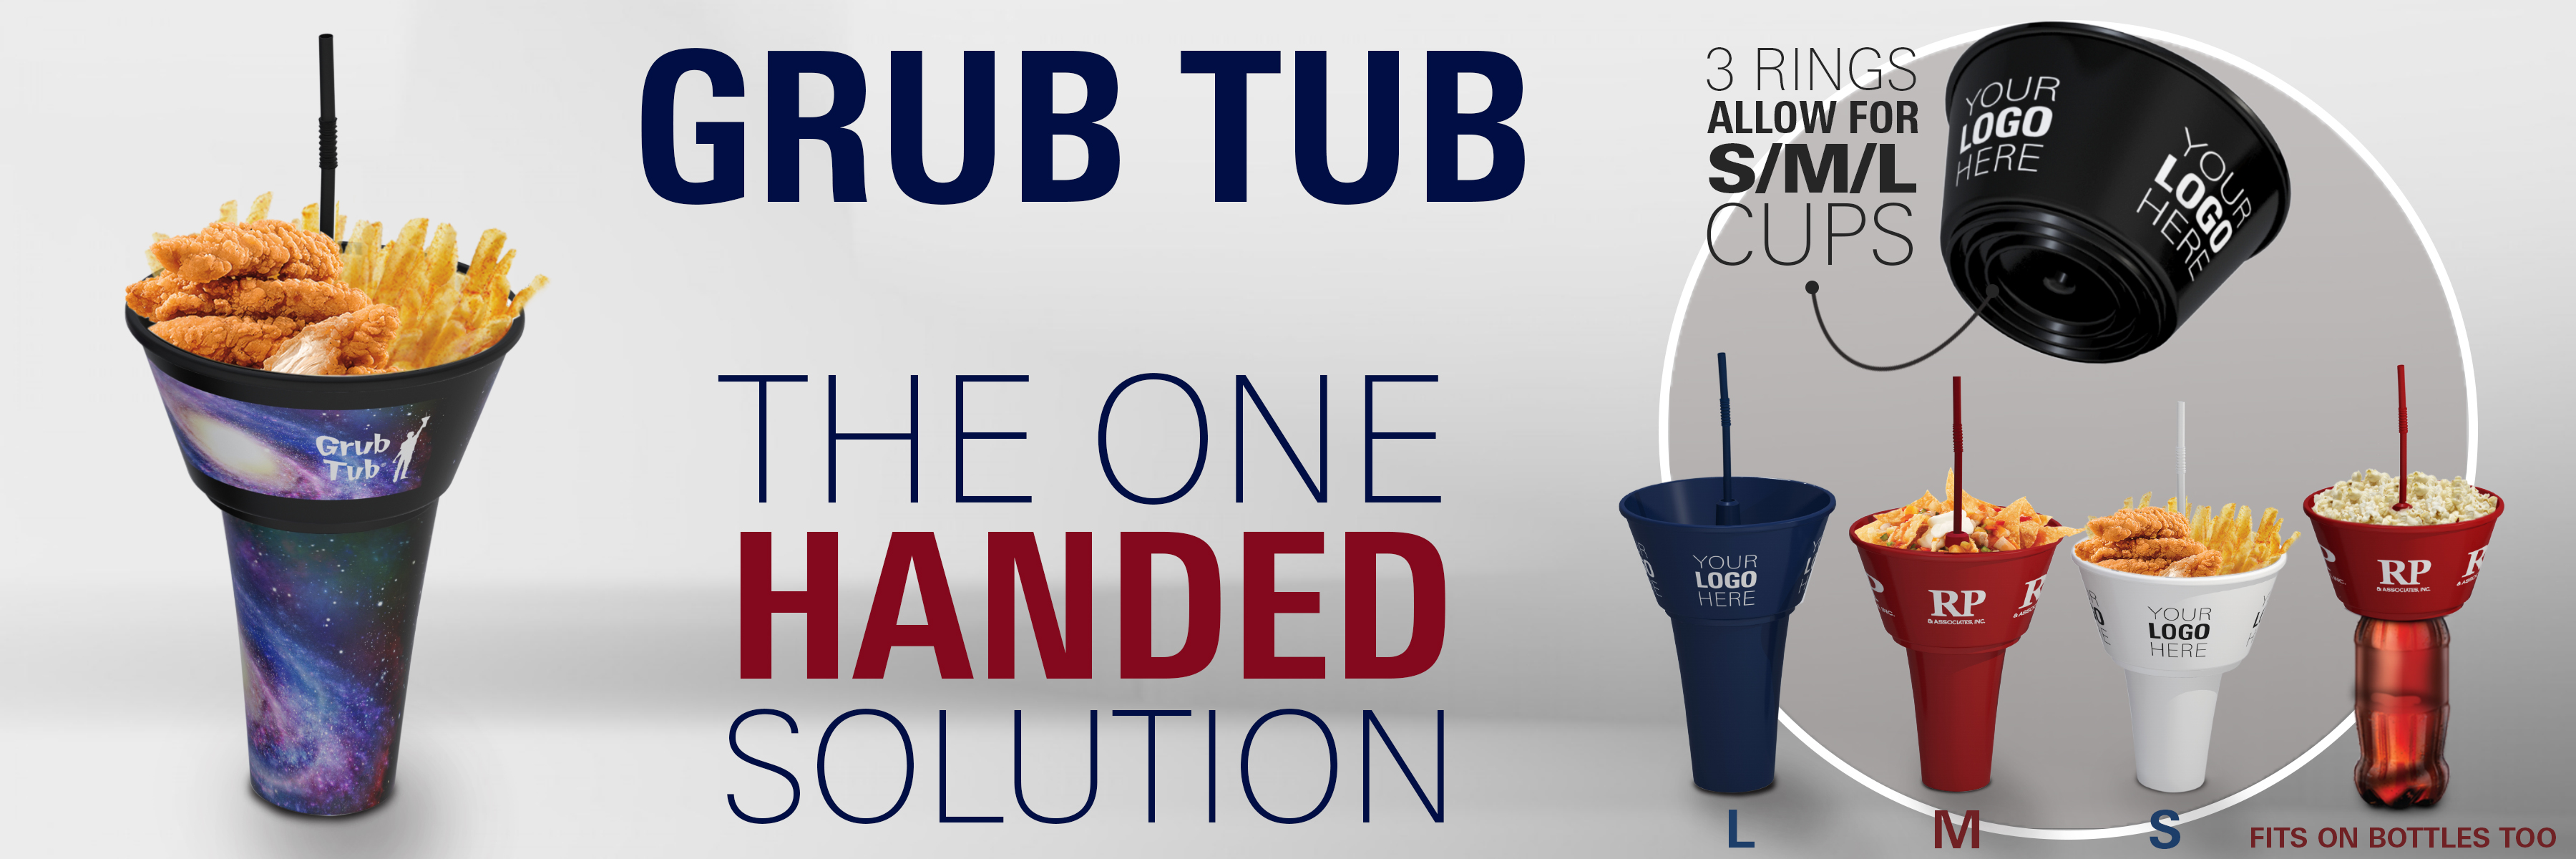 The Grub Tub Grab & Go Upseller